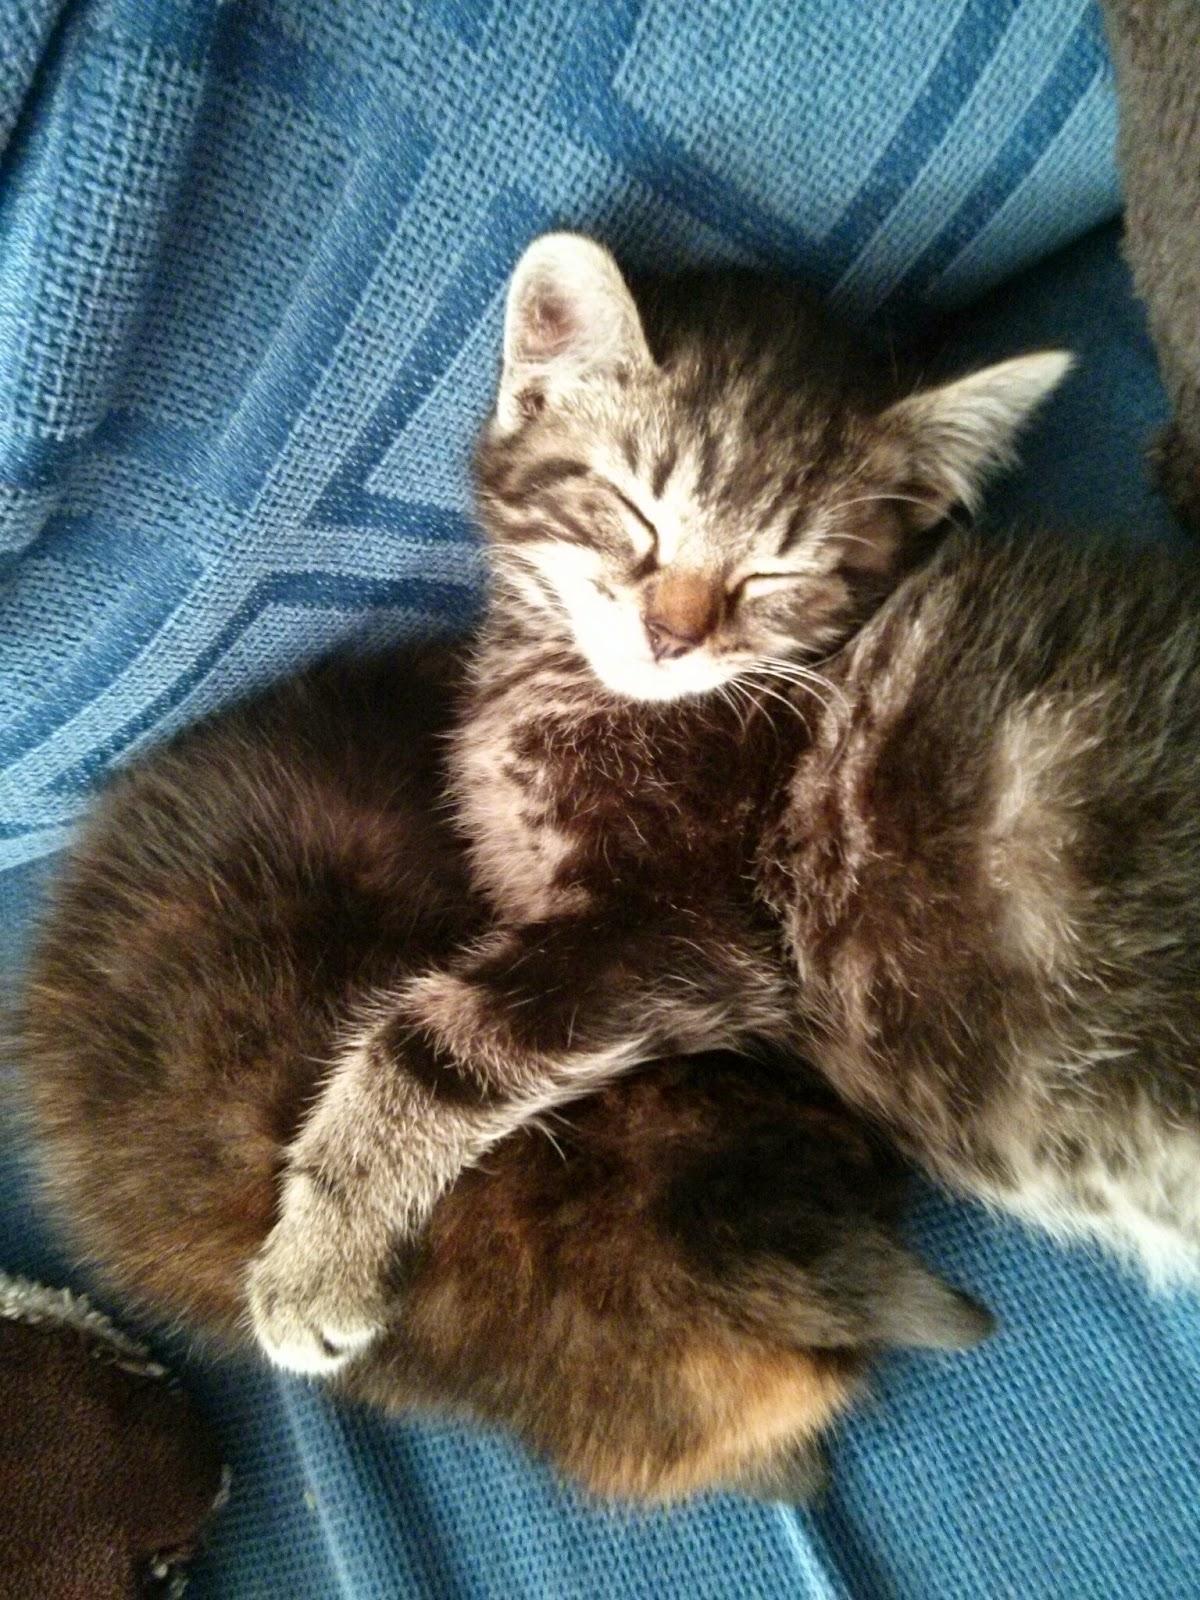 Mario and Peach The Kittens sleeping